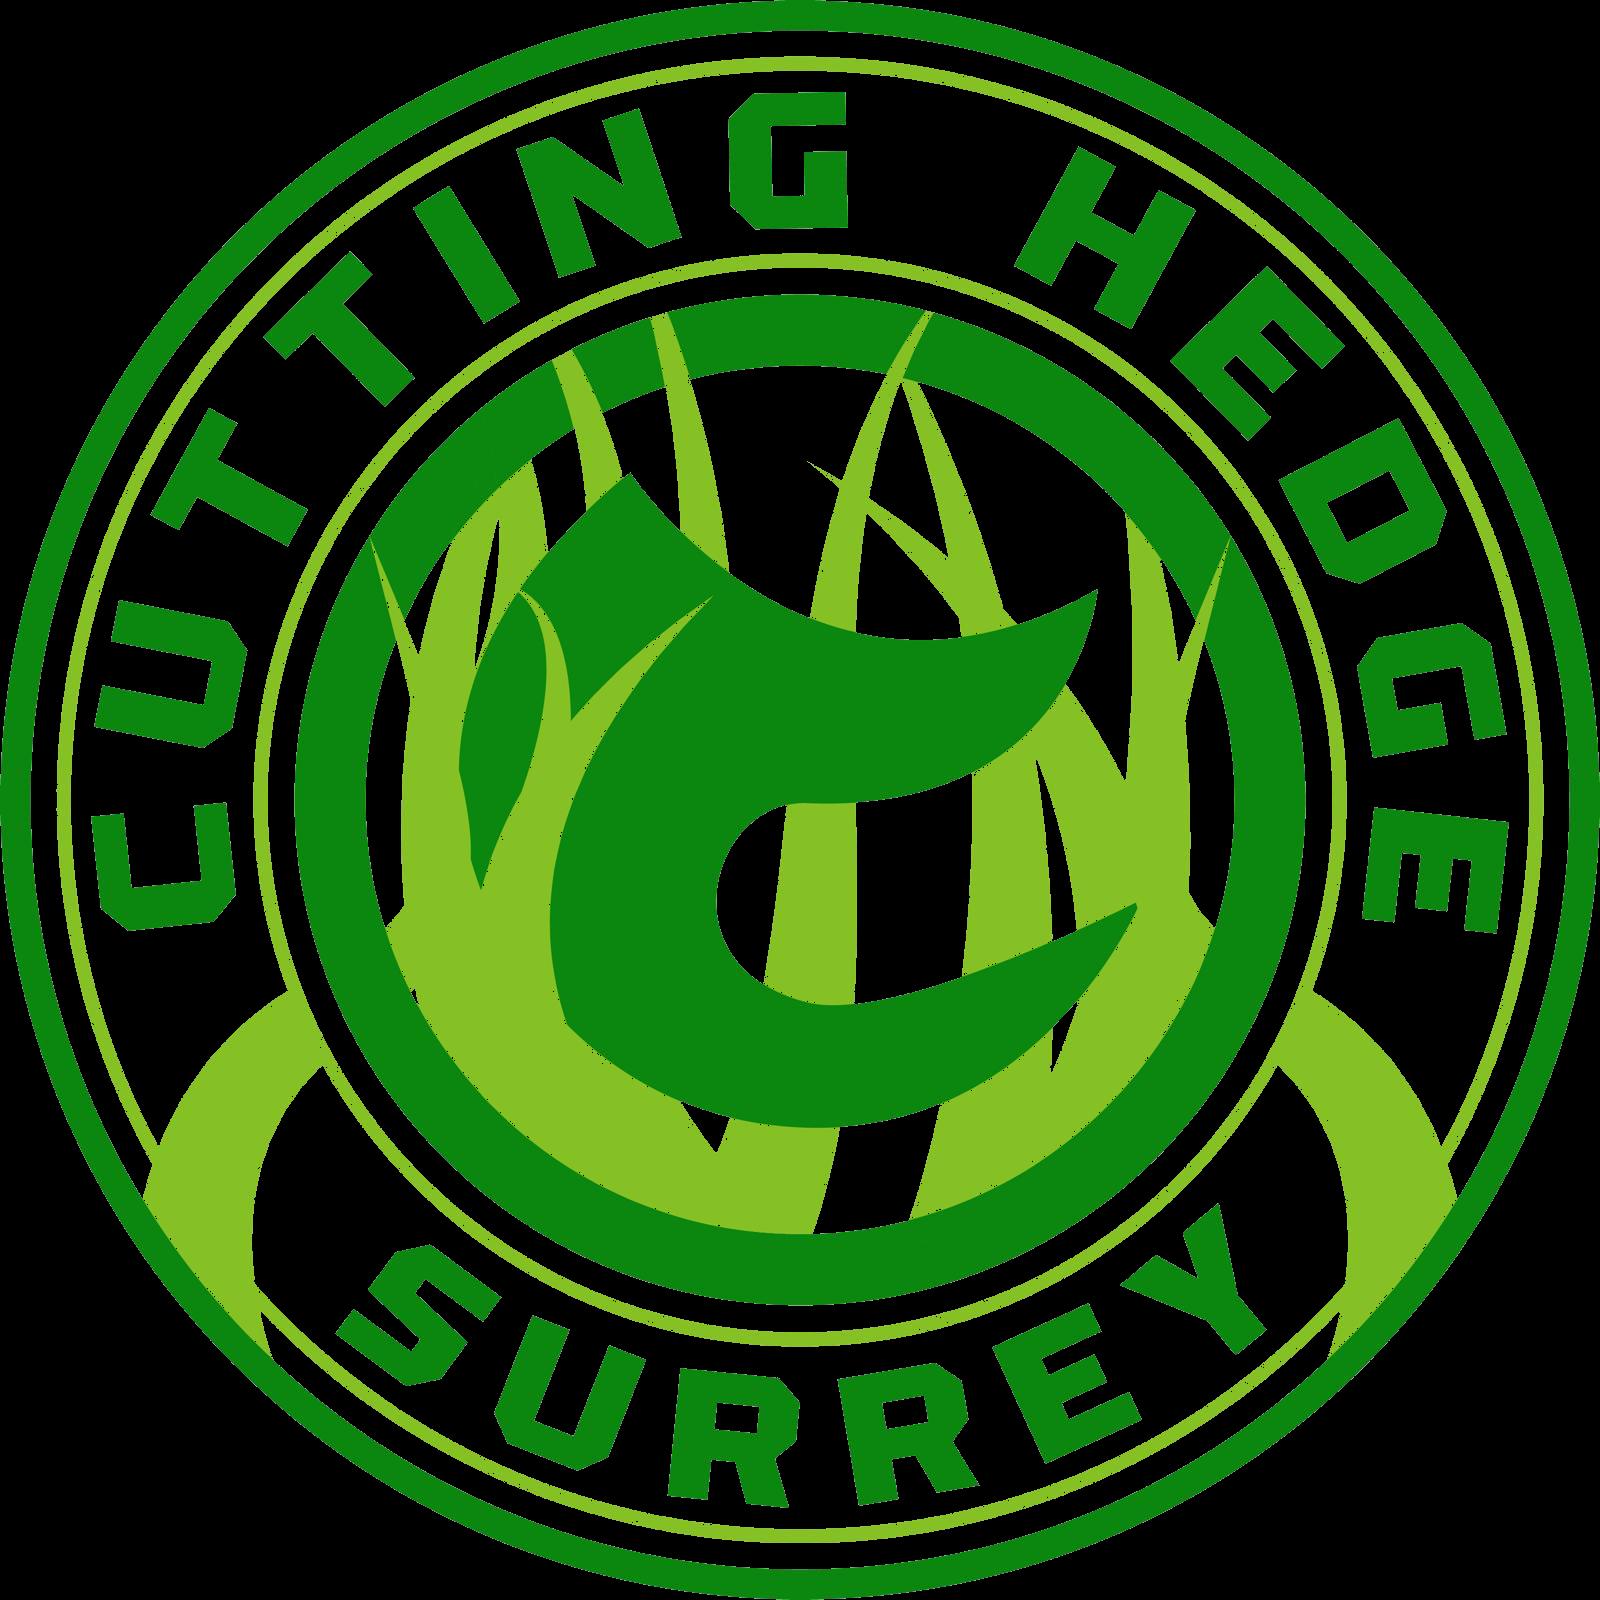 Cutting Hedge Surrey